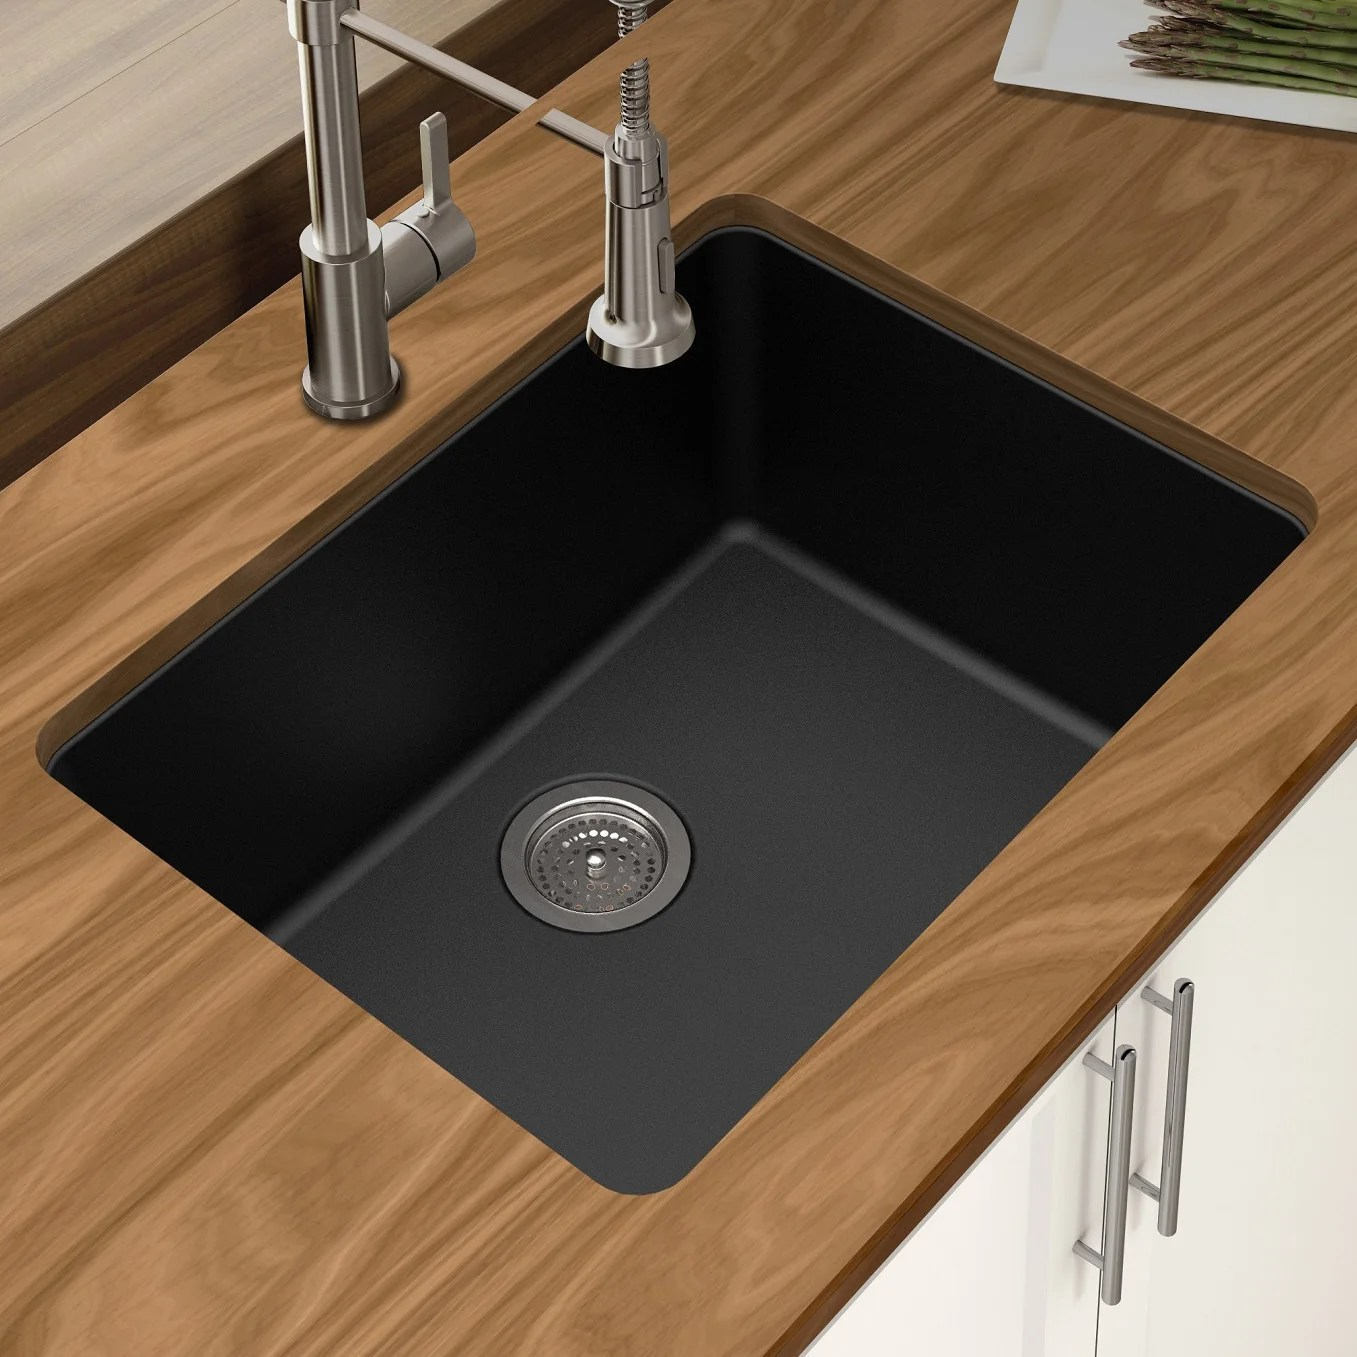 winpro black granite quartz 25 x 18 1 2 x 9 1 2 single bowl undermount sink